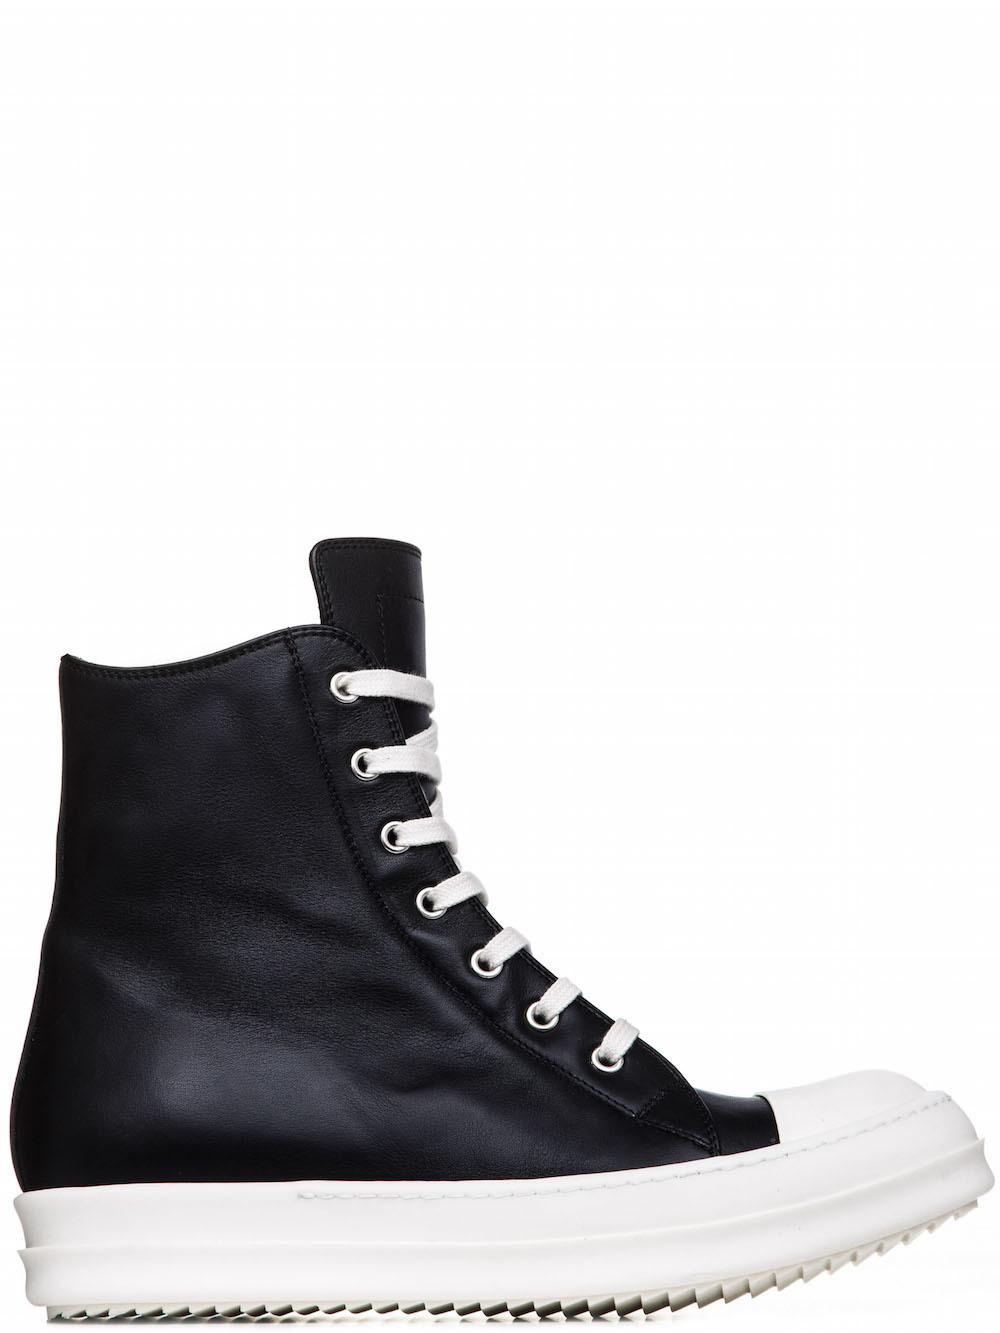 FOOTWEAR - Boots Rick Owens IPw5CSuIe